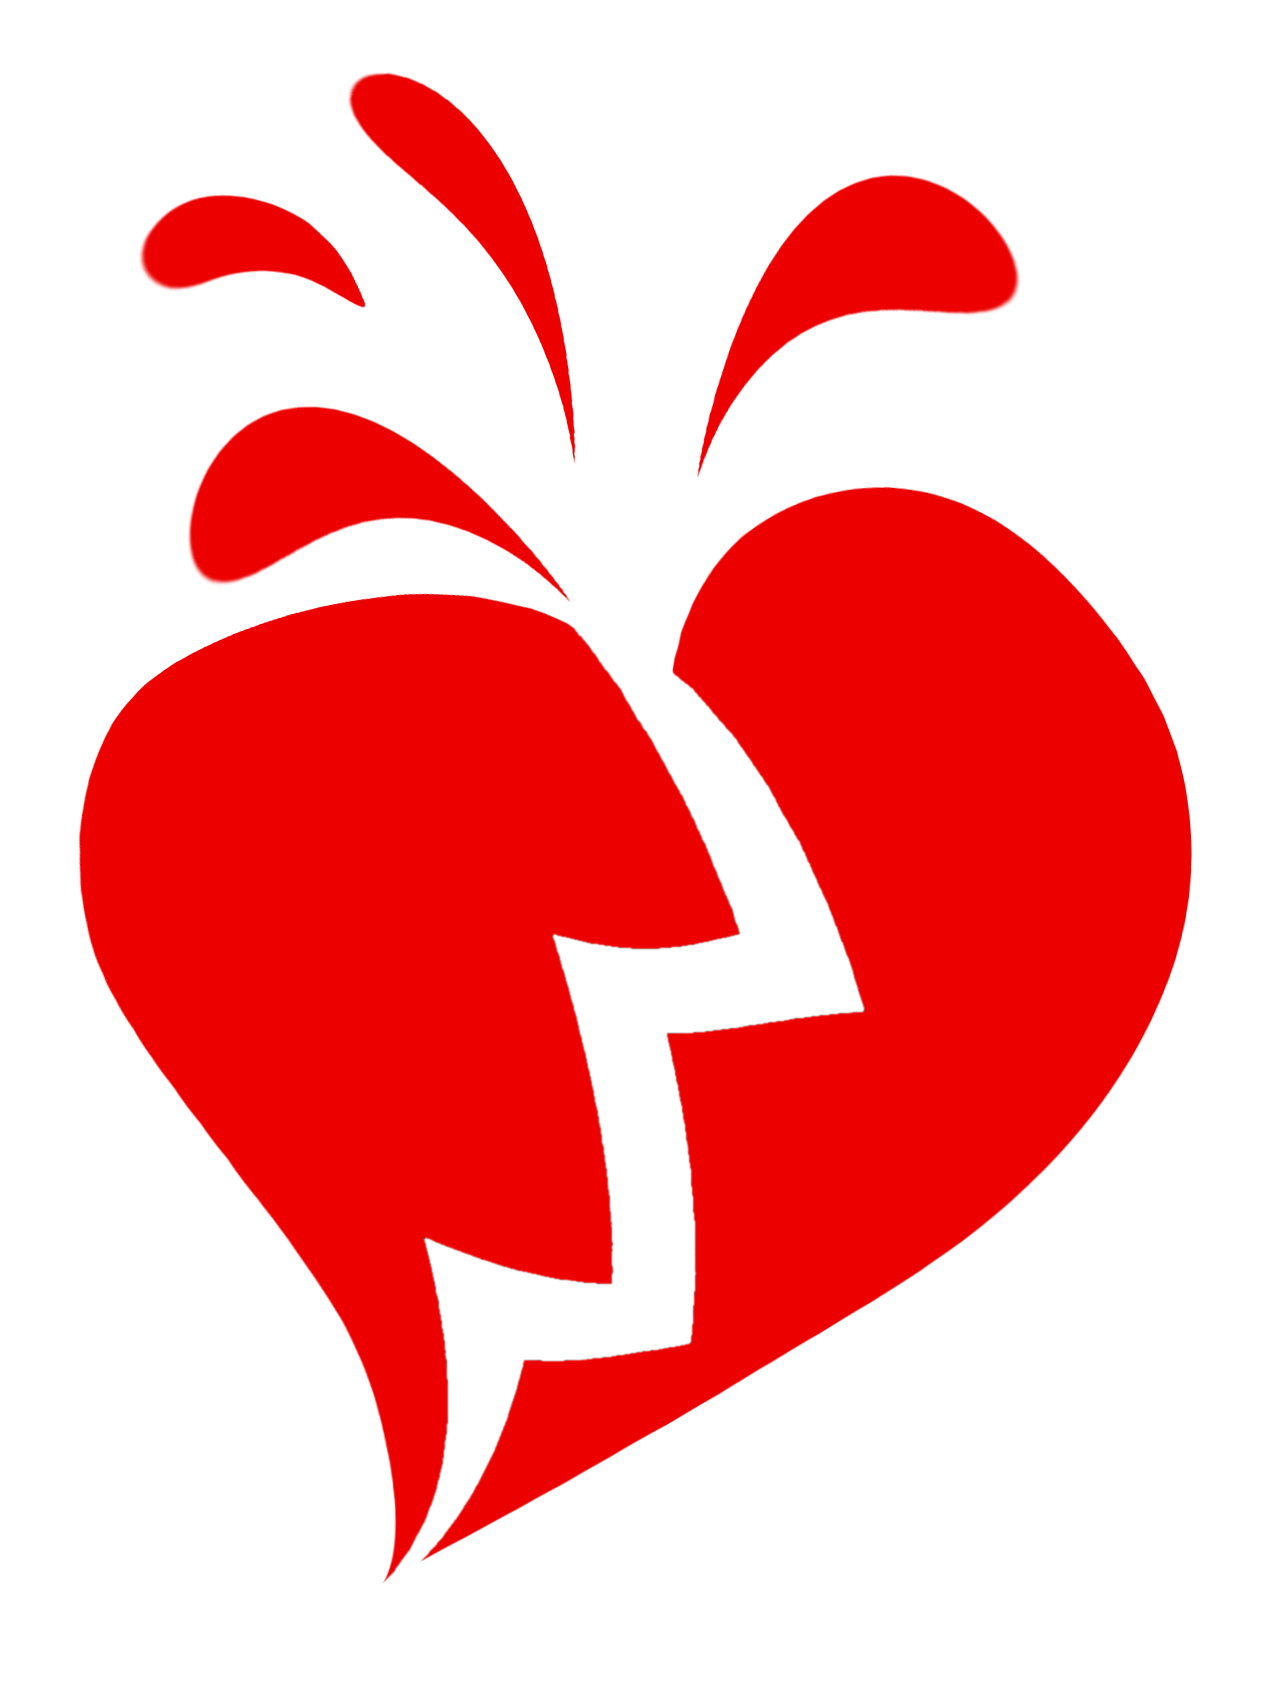 Hearts clipart person. Broken heart stock image